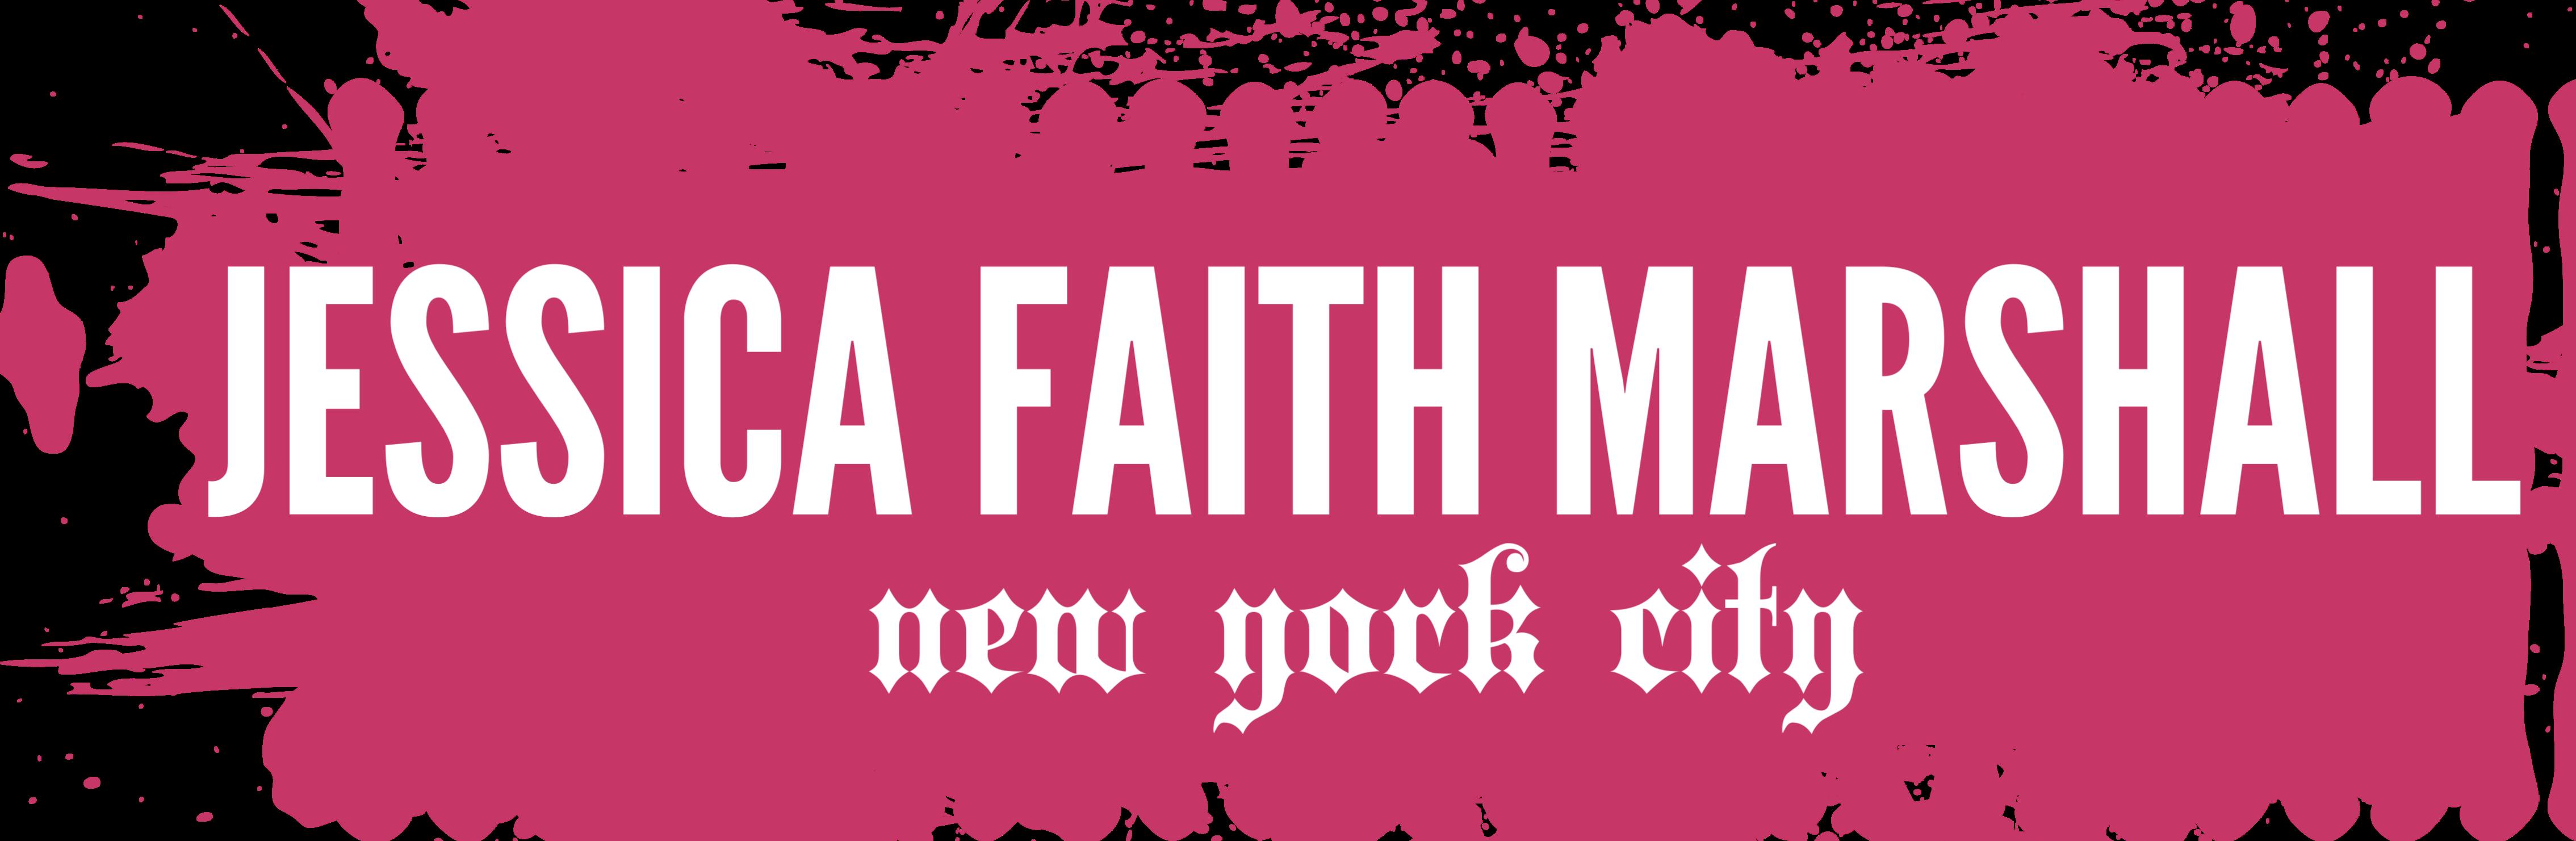 Jessica Faith Marshall NYC